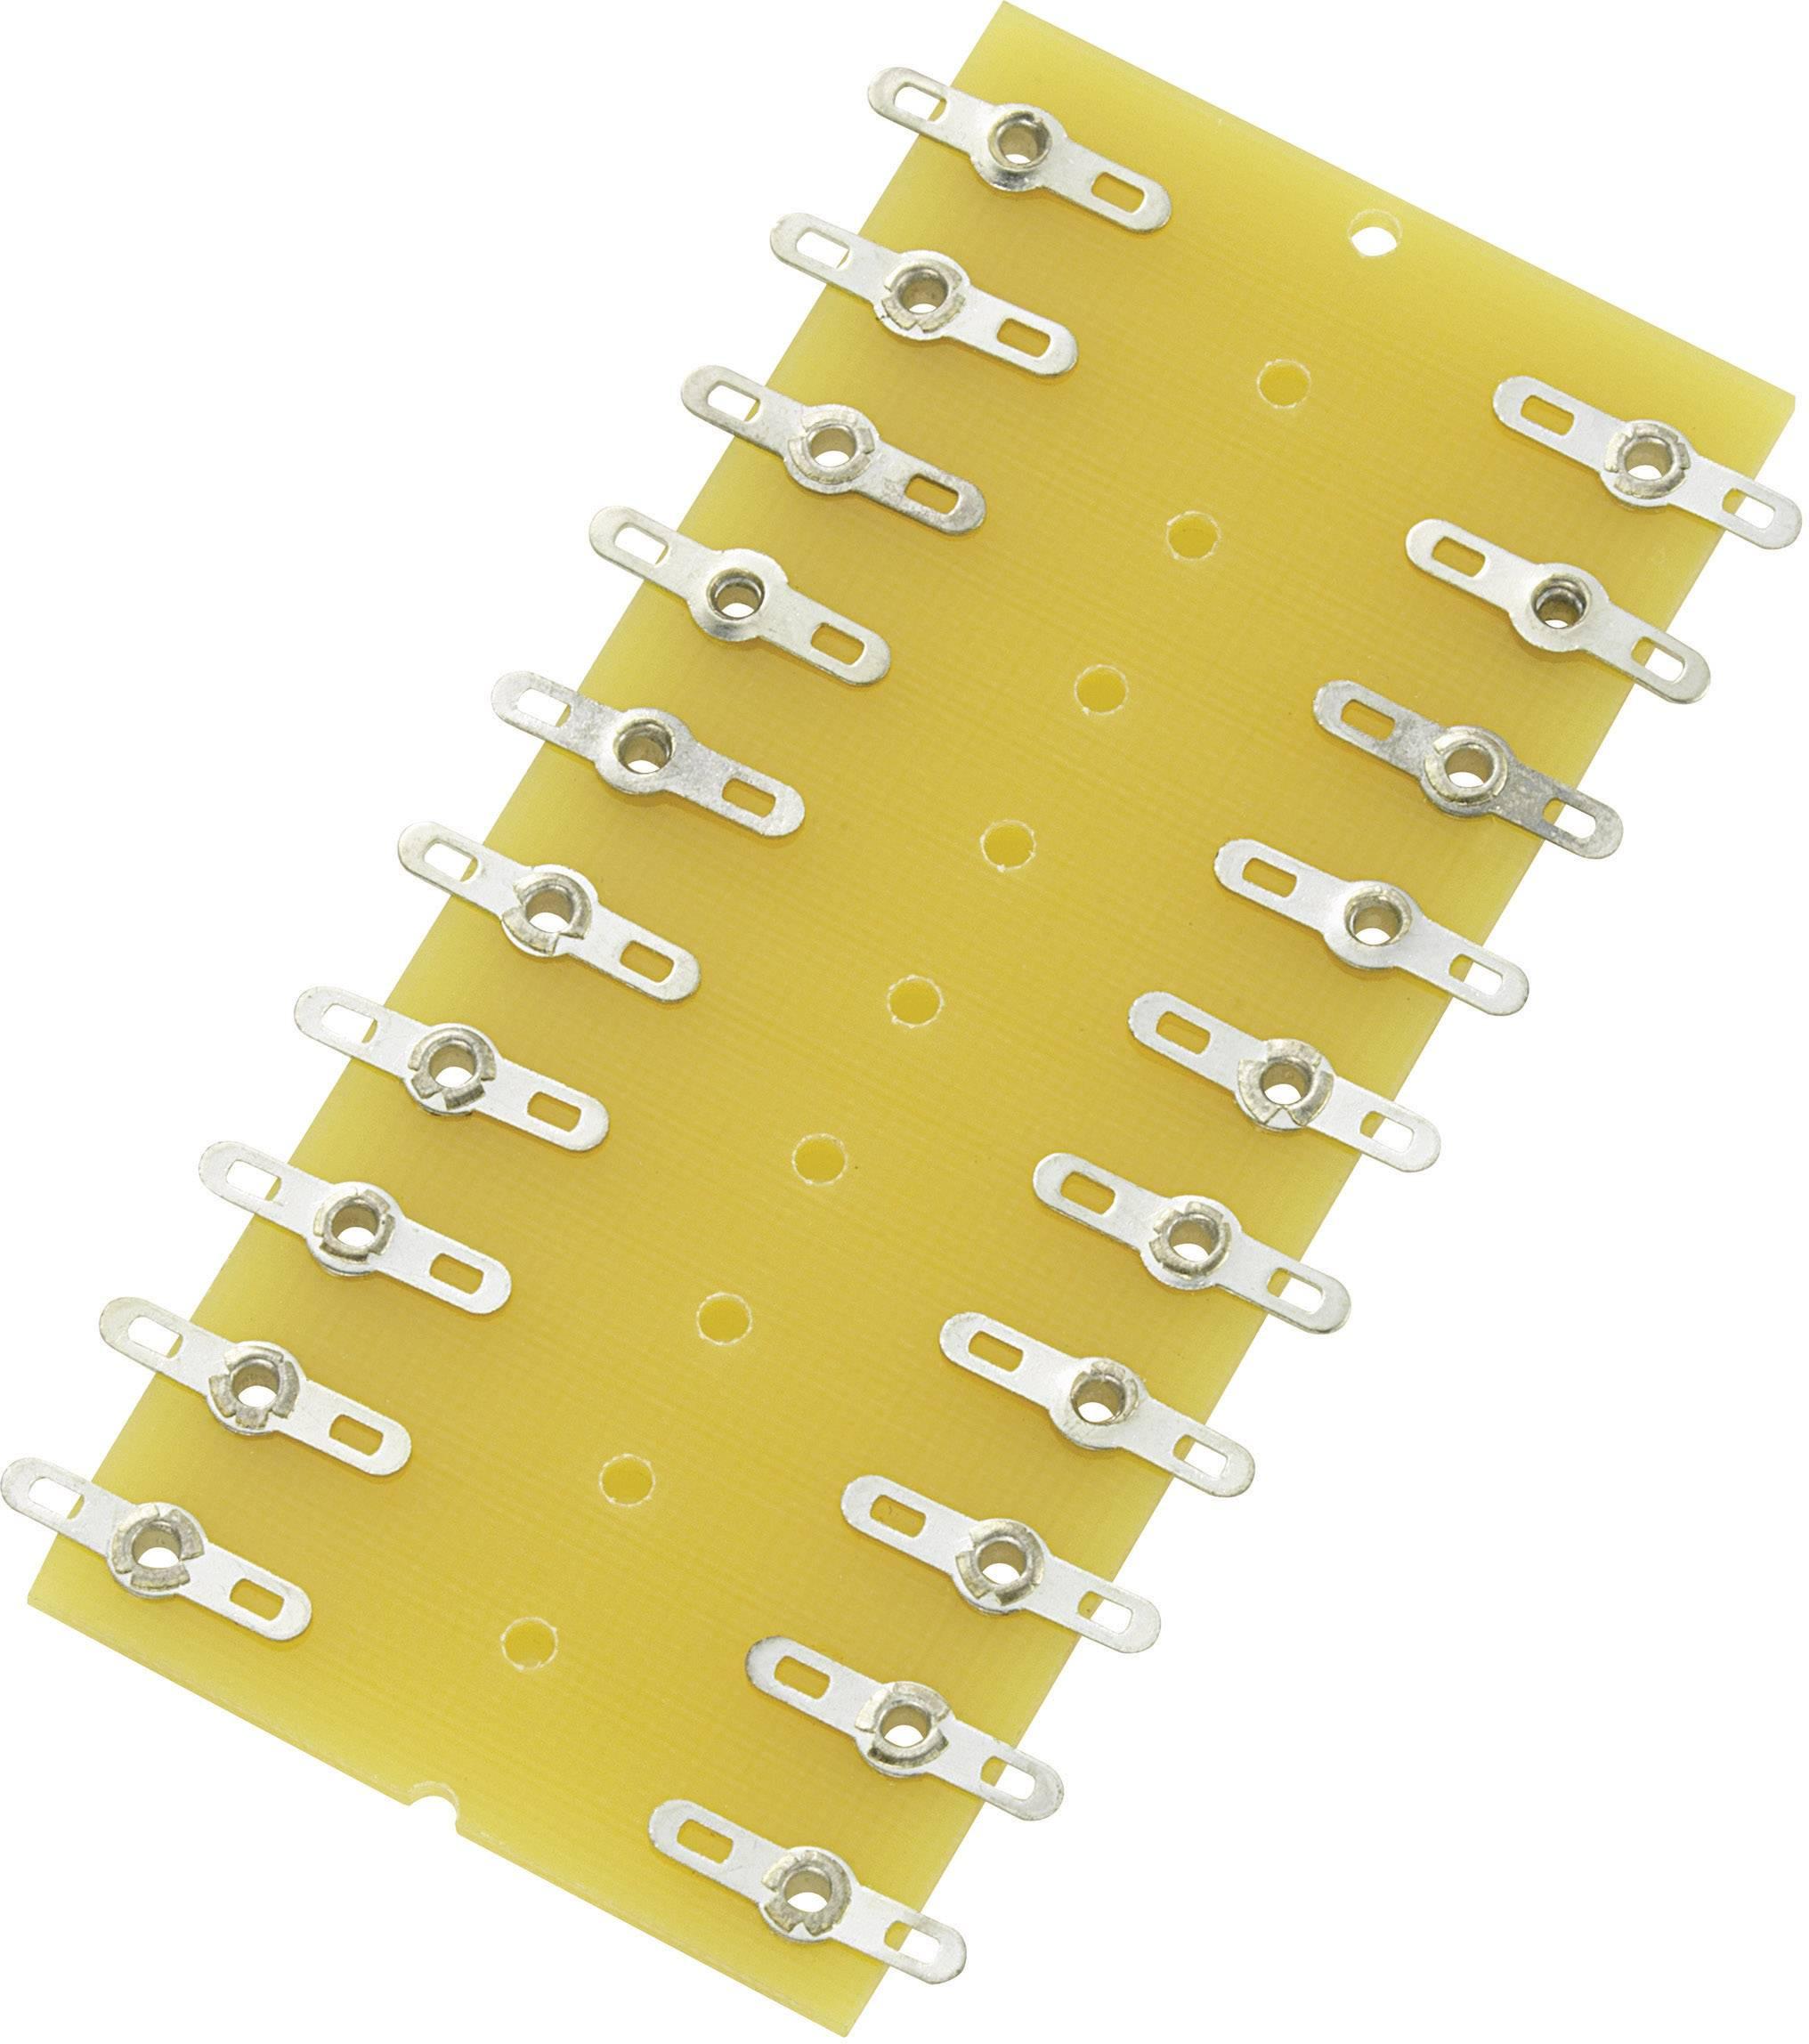 Spájkovacia lišta Conrad Components 530357, pólov 20, (d x š x v) 82 x 38 x 1.6 mm, 1 ks